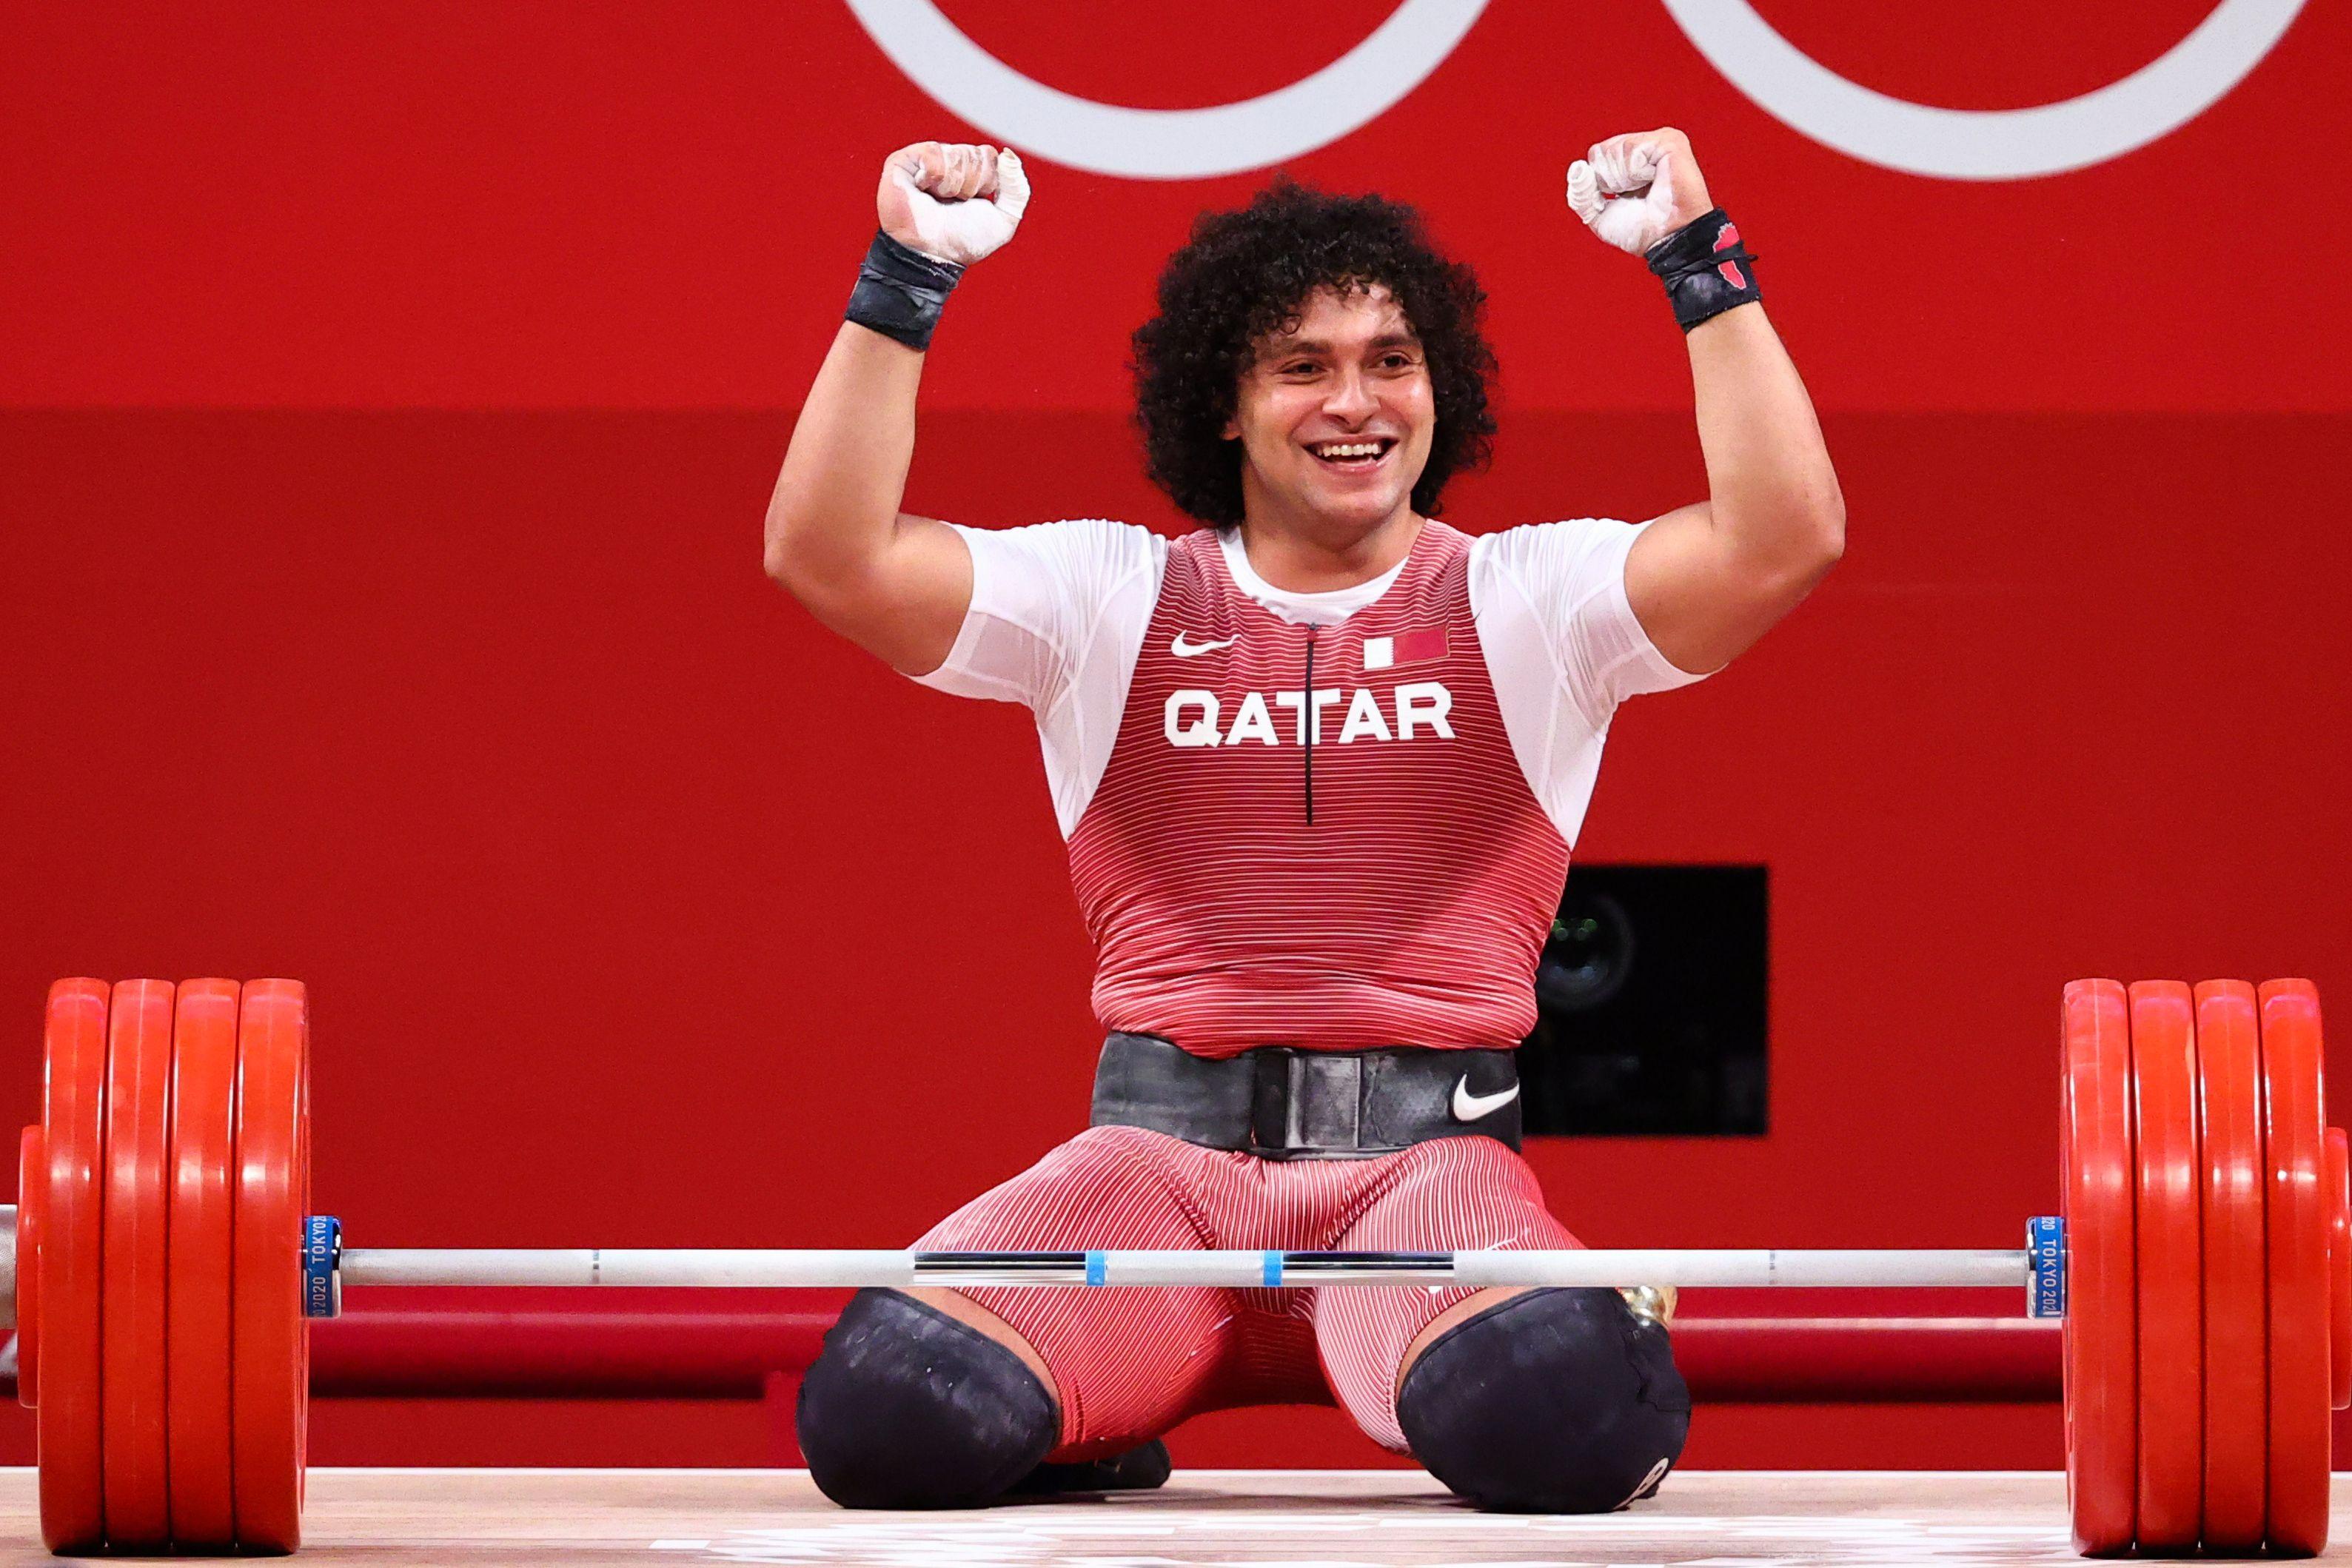 Tokyo 2020 Olympics - Weightlifting - Men's 96kg - Group A - Tokyo International Forum, Tokyo, Japan - July 31, 2021. Fares Ibrahim Elbakh of Qatar celebrates. REUTERS/Edgard Garrido